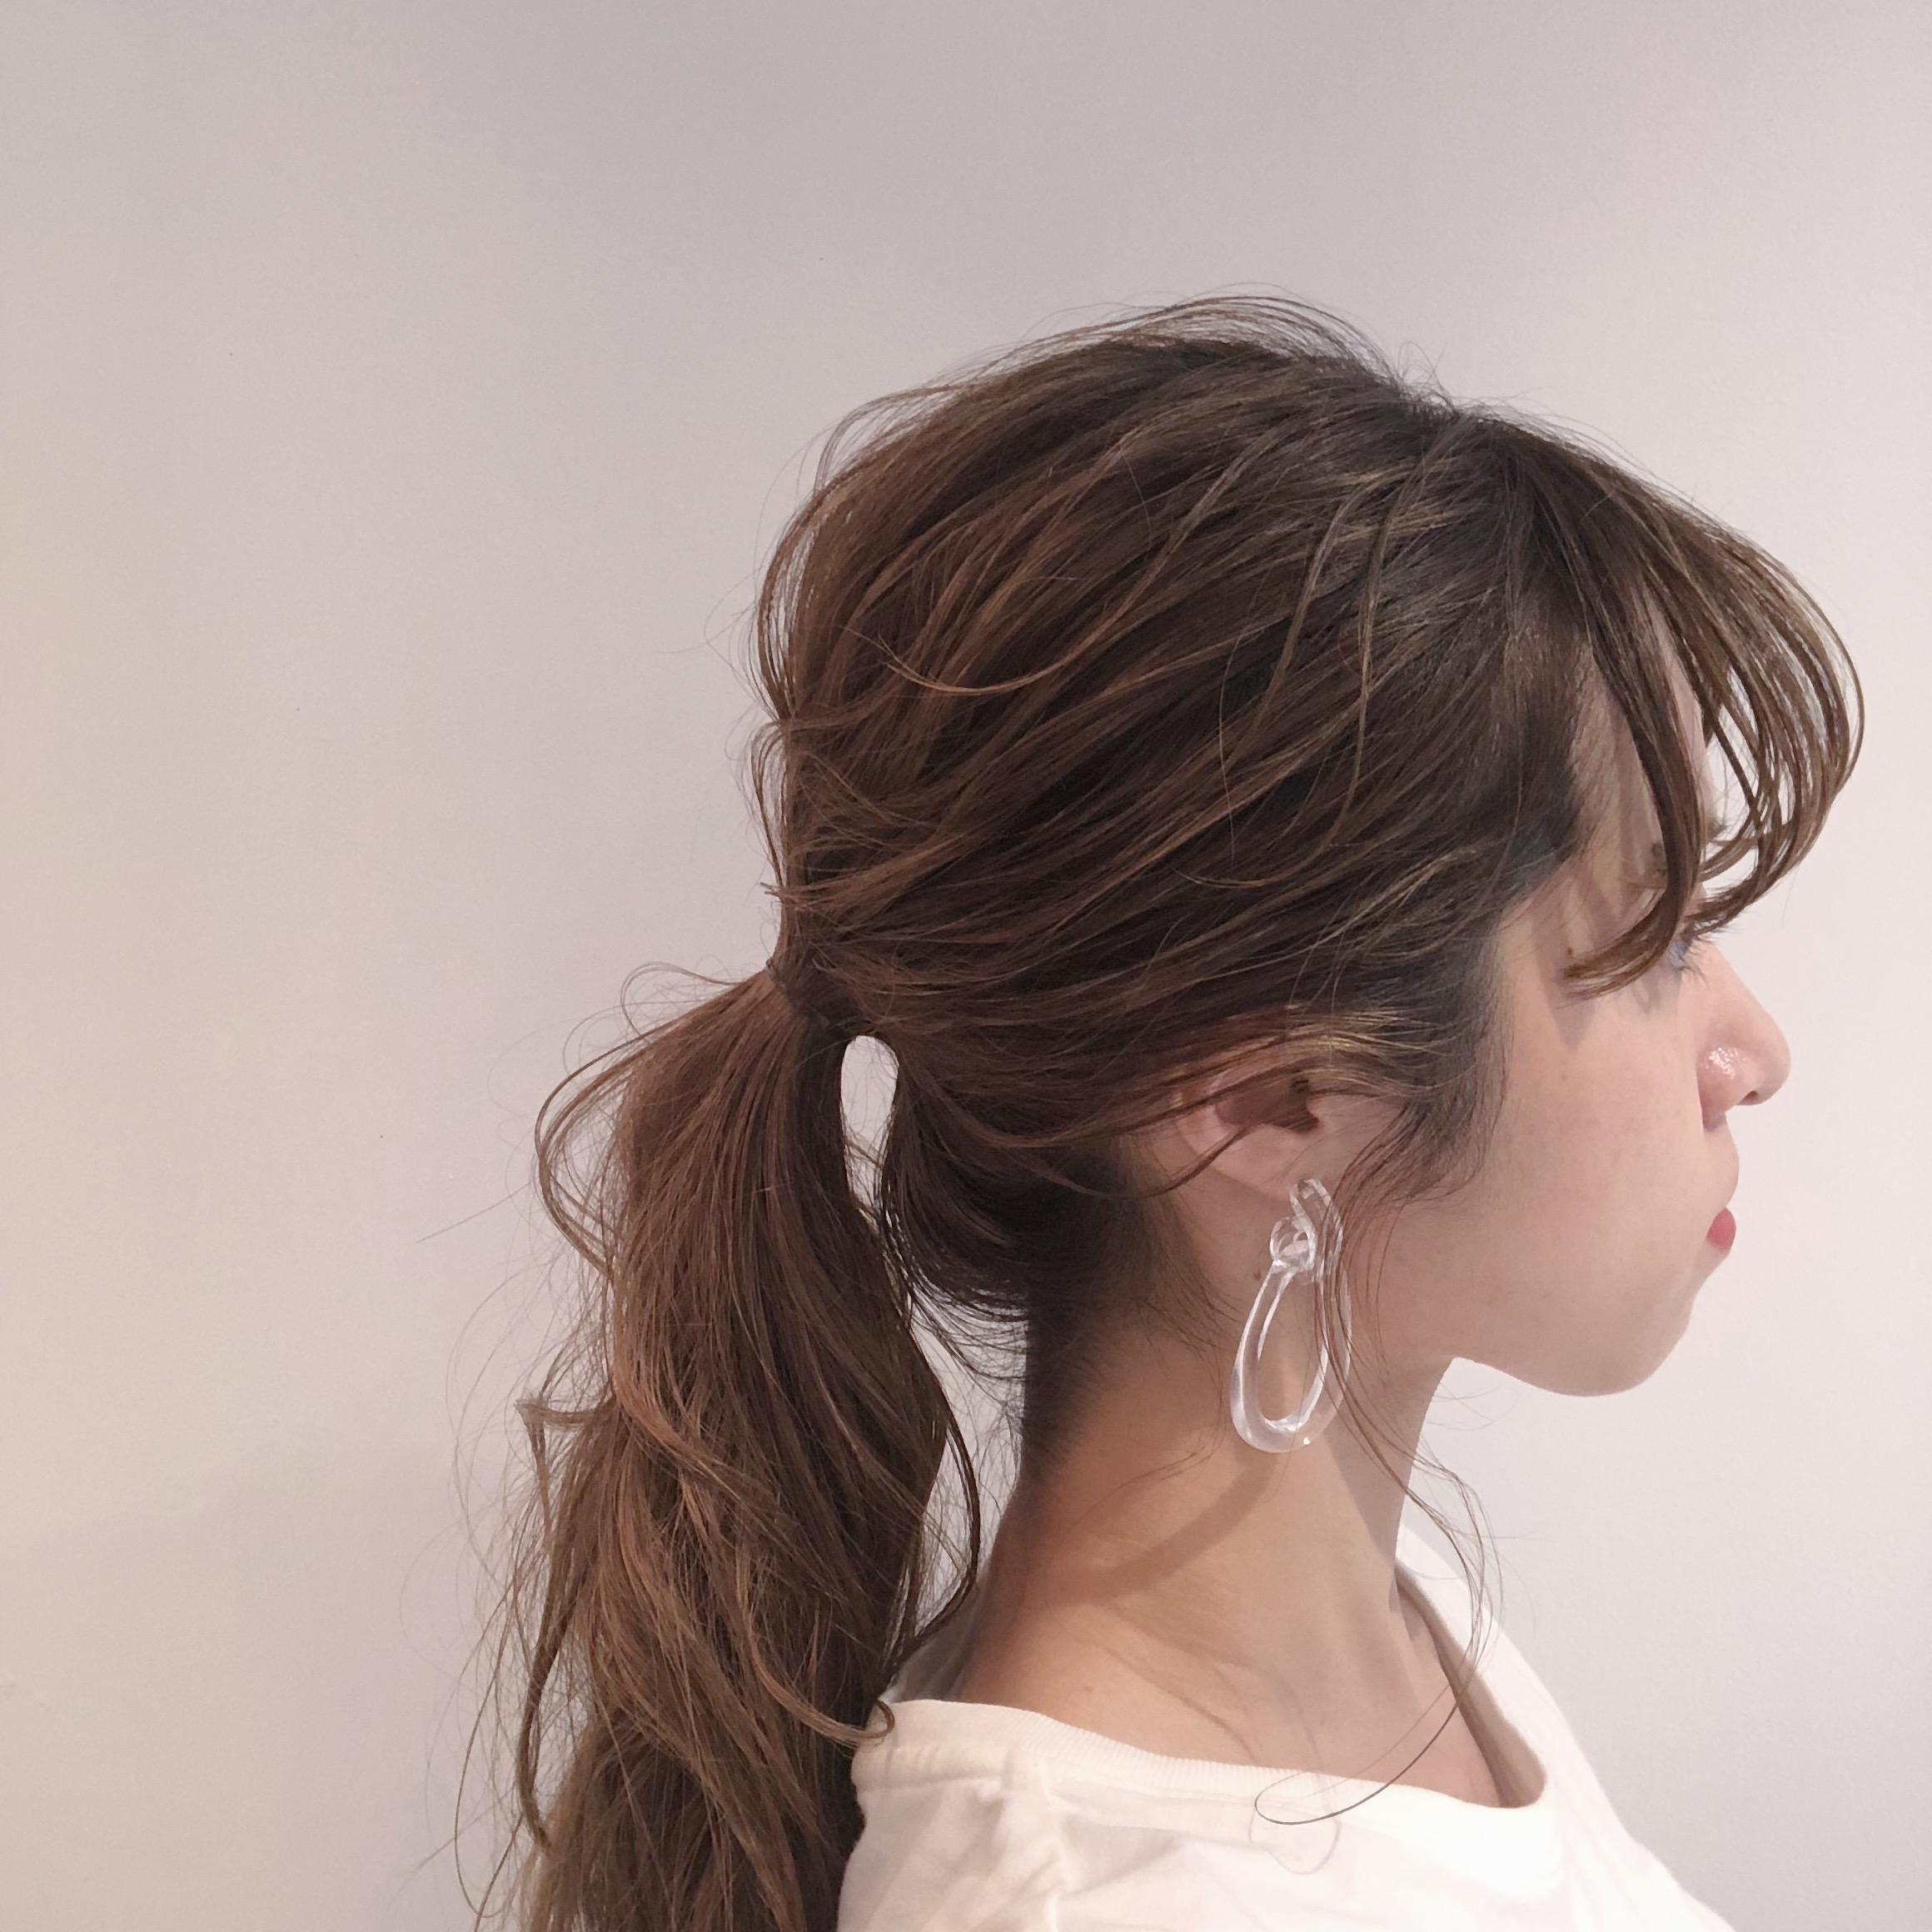 http://www.hairsalon-cherish.com/asset/F5BCE21F-1420-4F74-8232-B3E1FA9022FF.jpeg